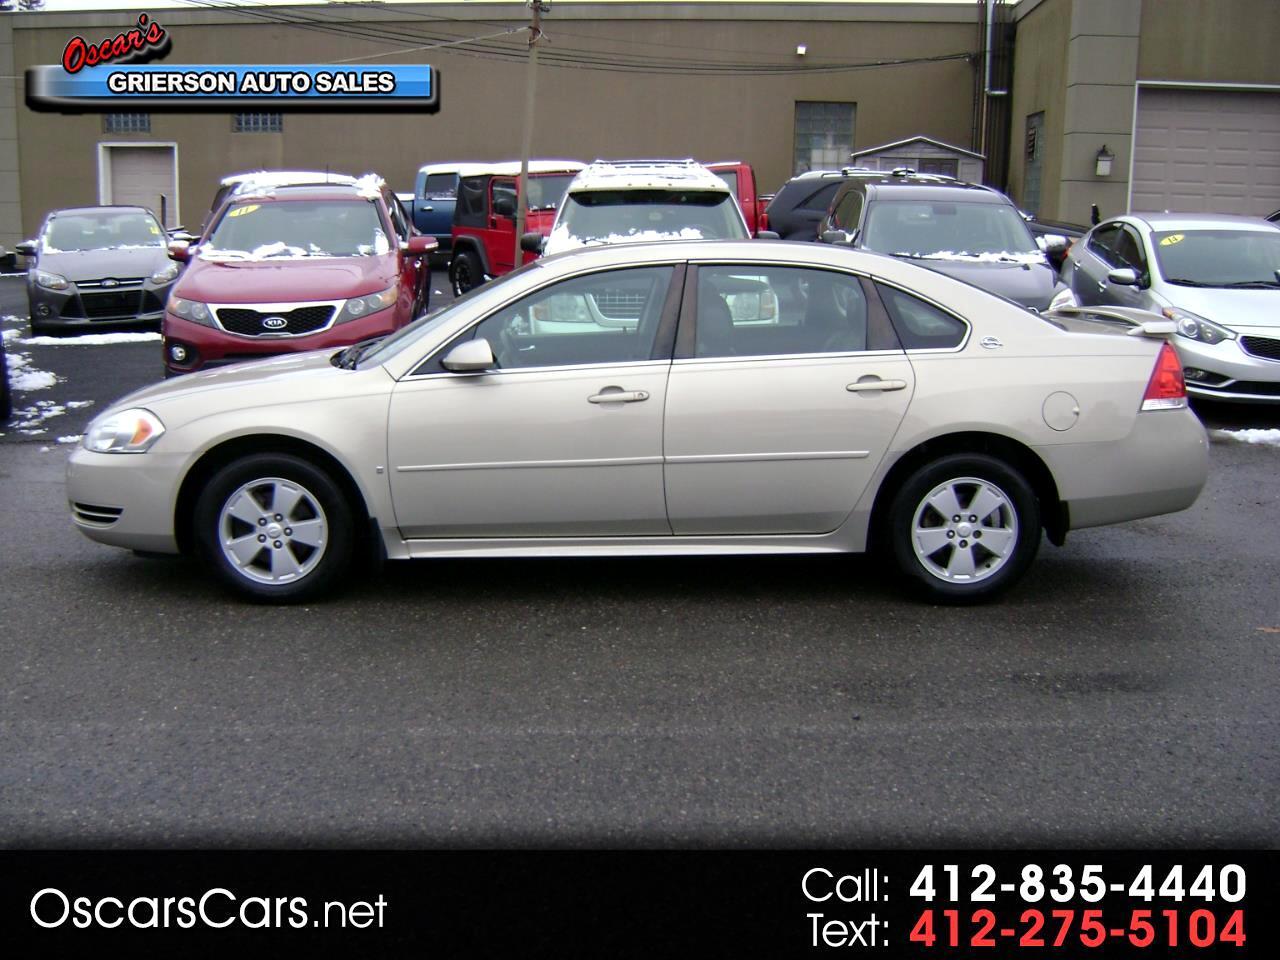 2009 Chevrolet Impala 4dr Sdn 3.5L LT